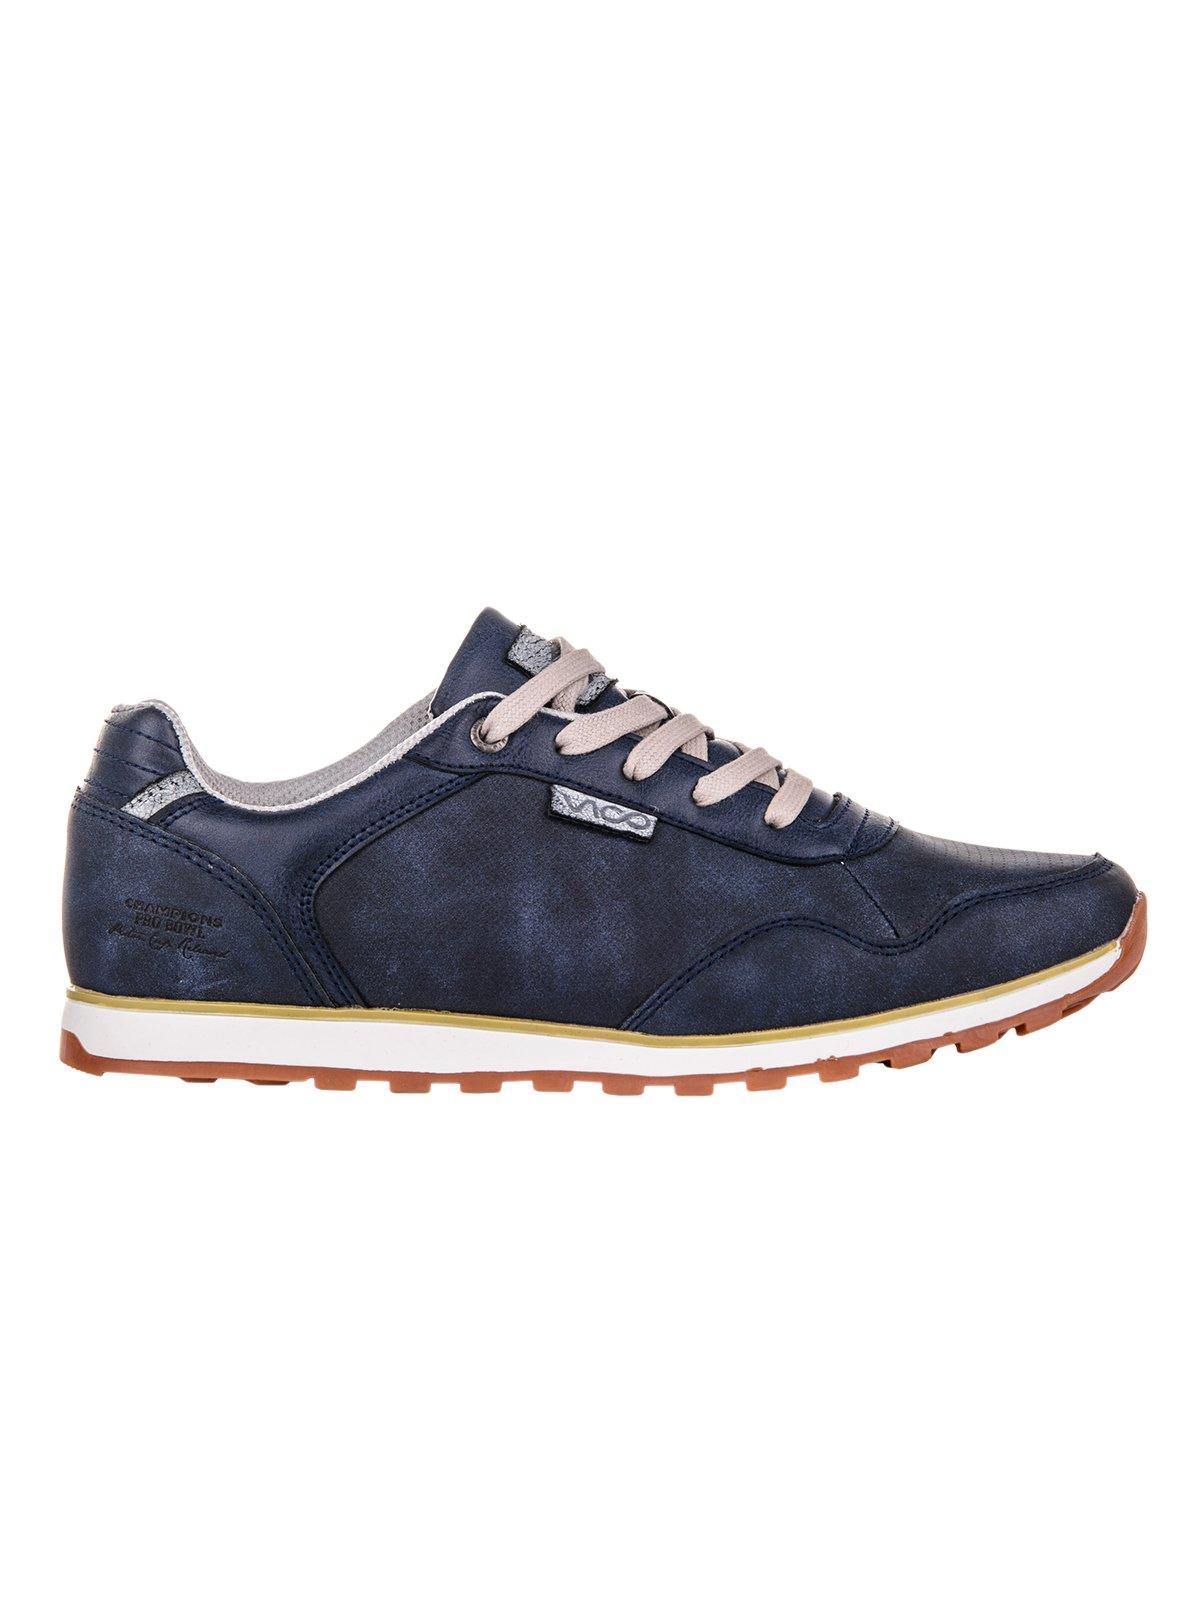 Buty MĘskie Sportowe Sneakersy T073 - Granatowe